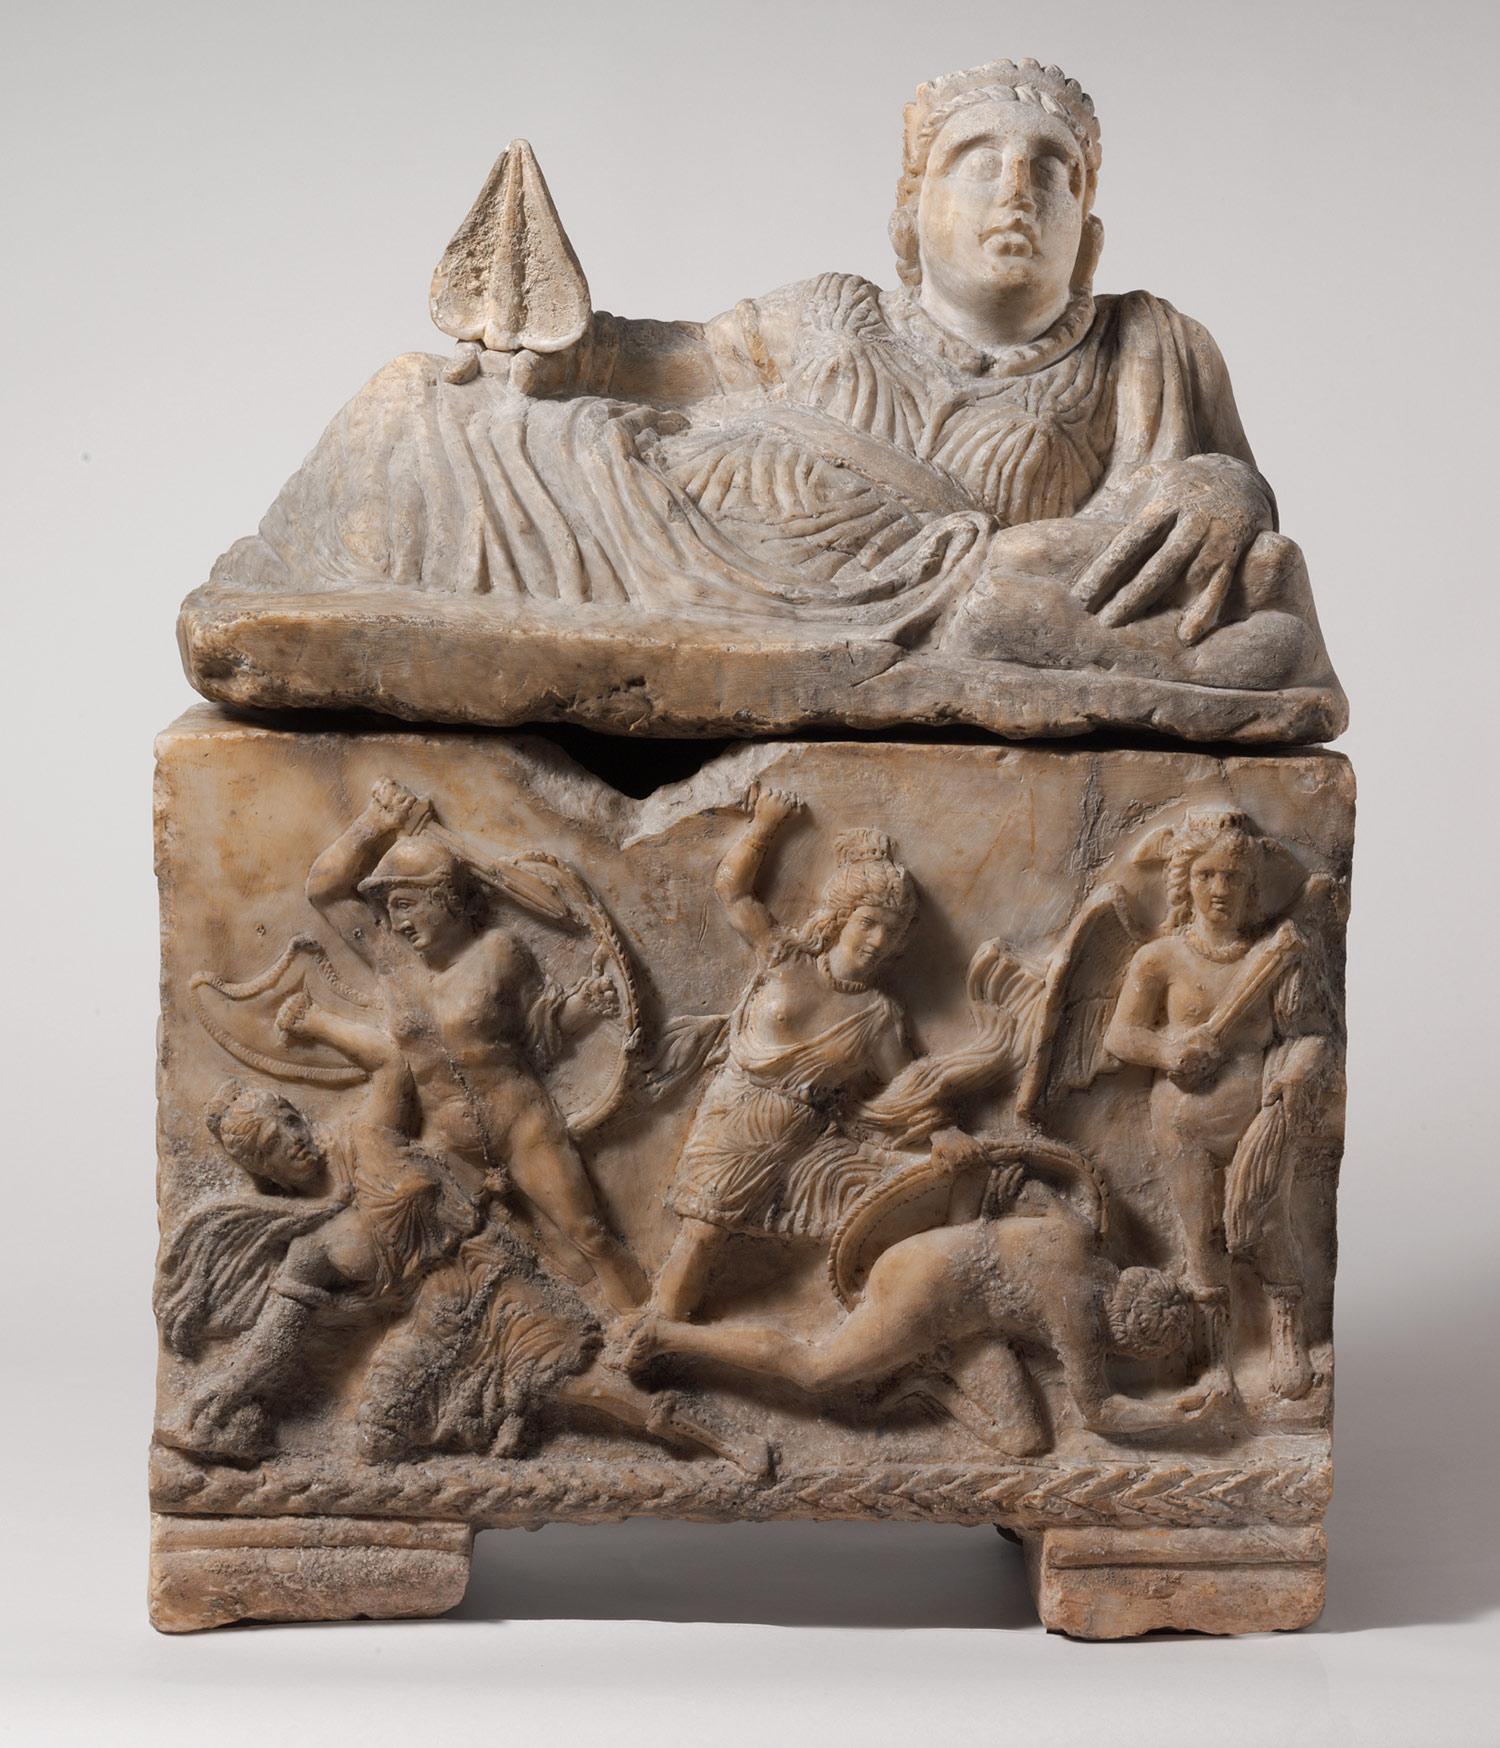 Etruscan religion